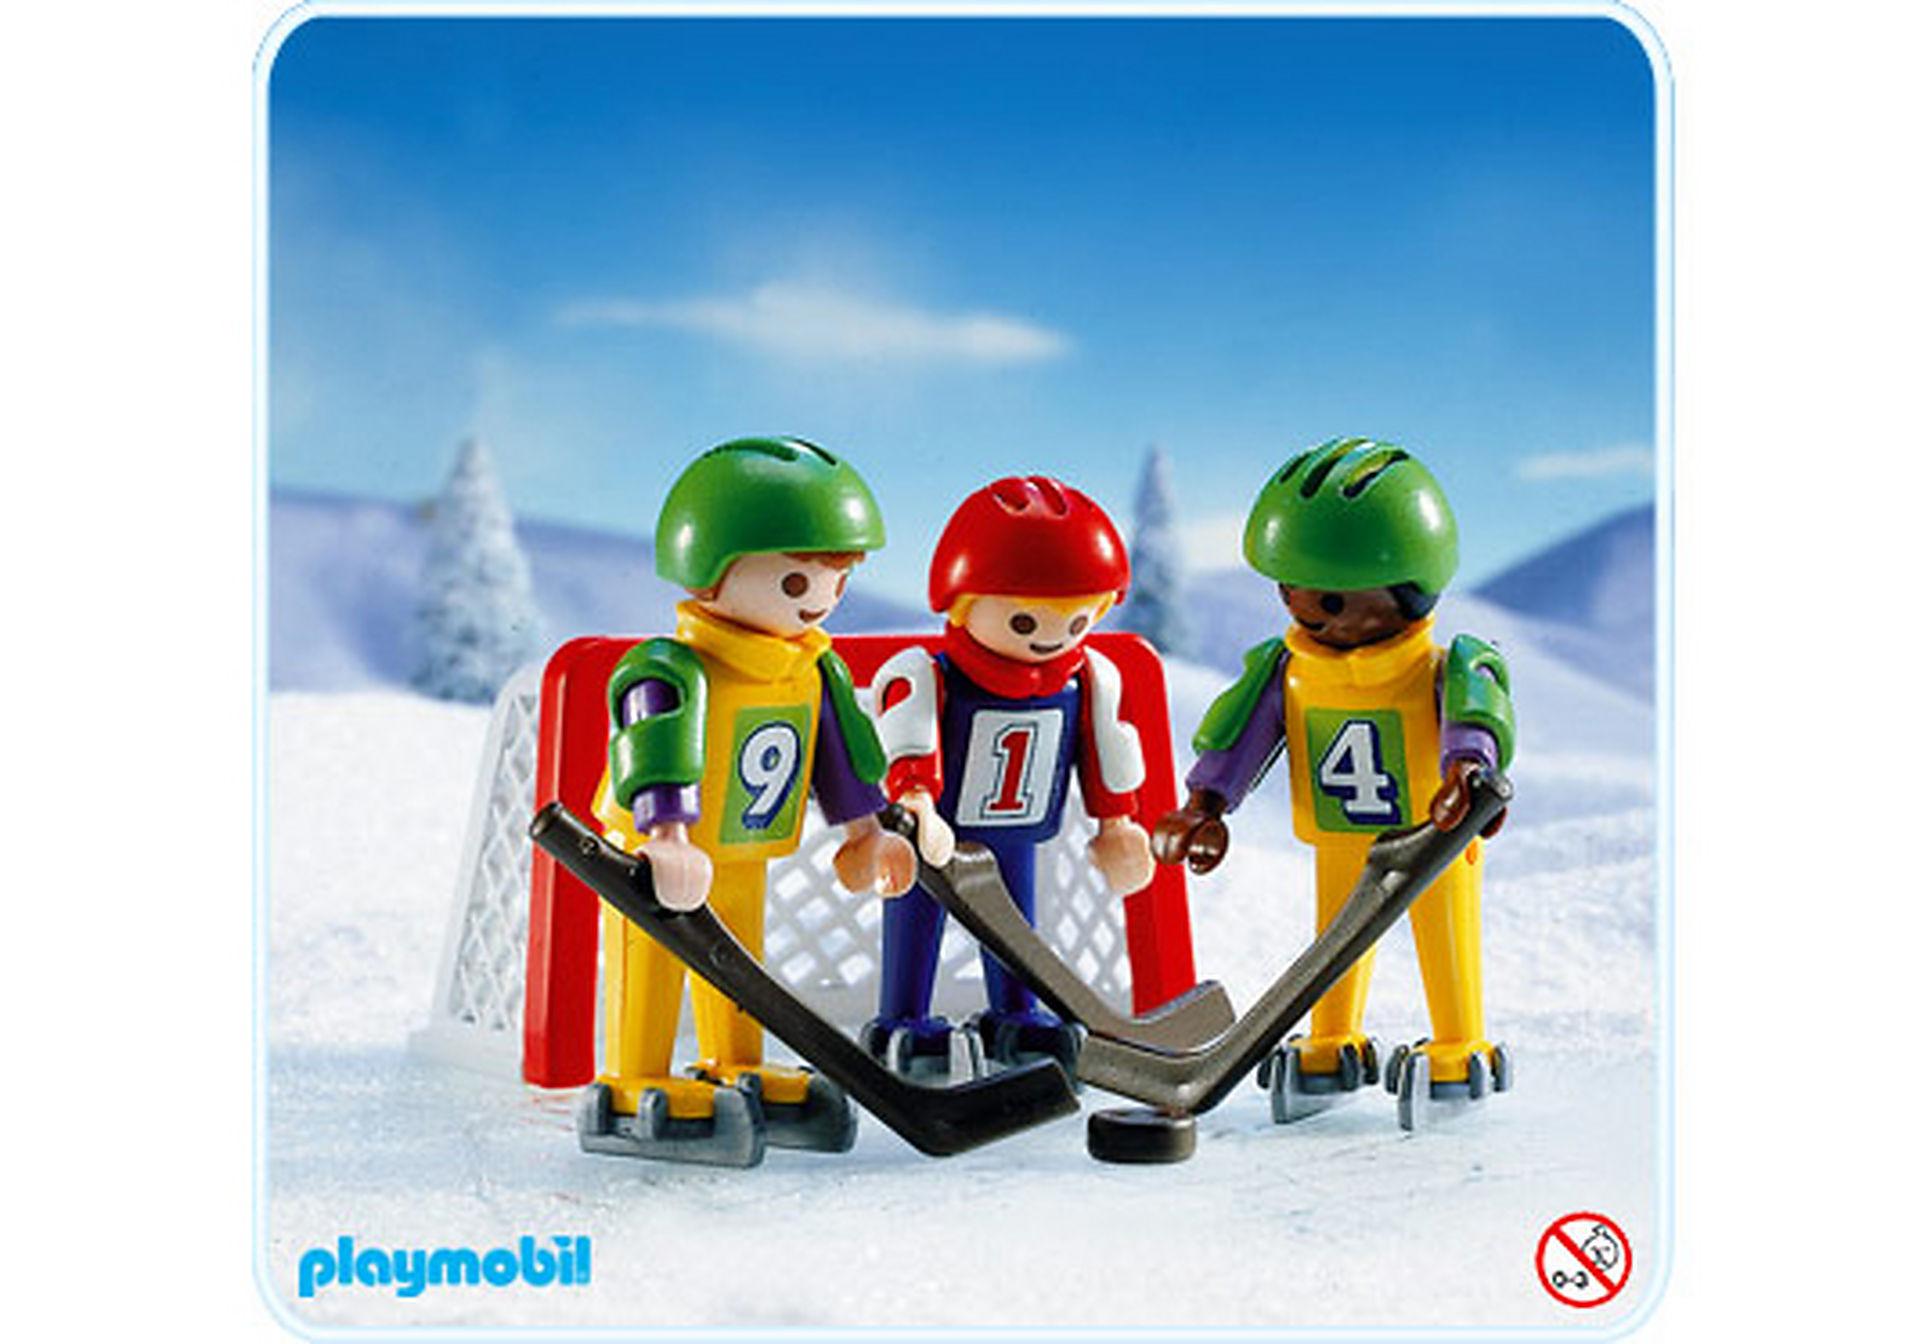 3685-A 3 Eishockeyspieler zoom image1